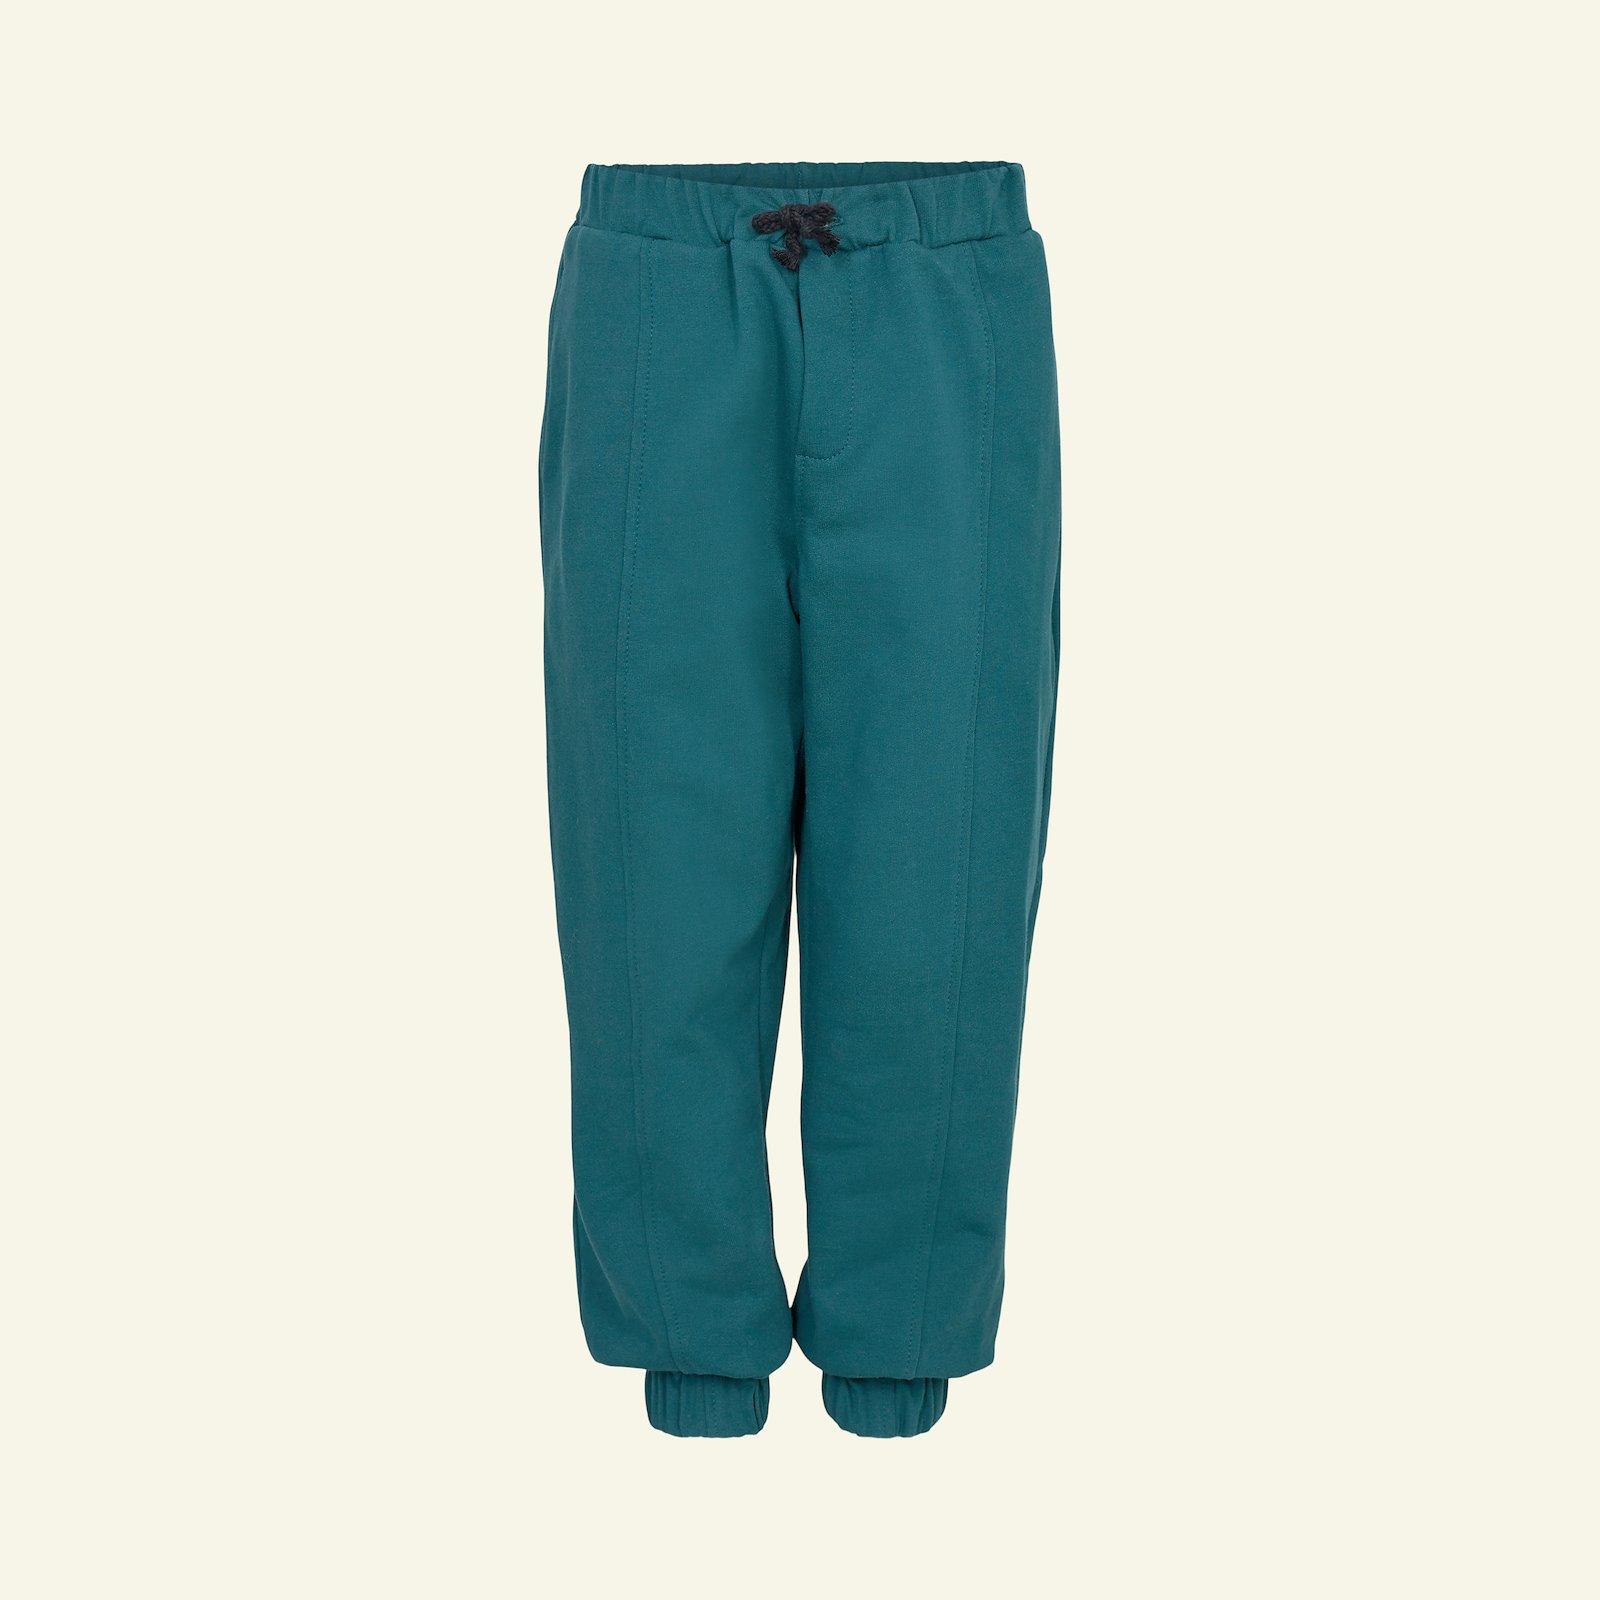 Sweat pants, 164/14y p60040_211775_75243_sskit